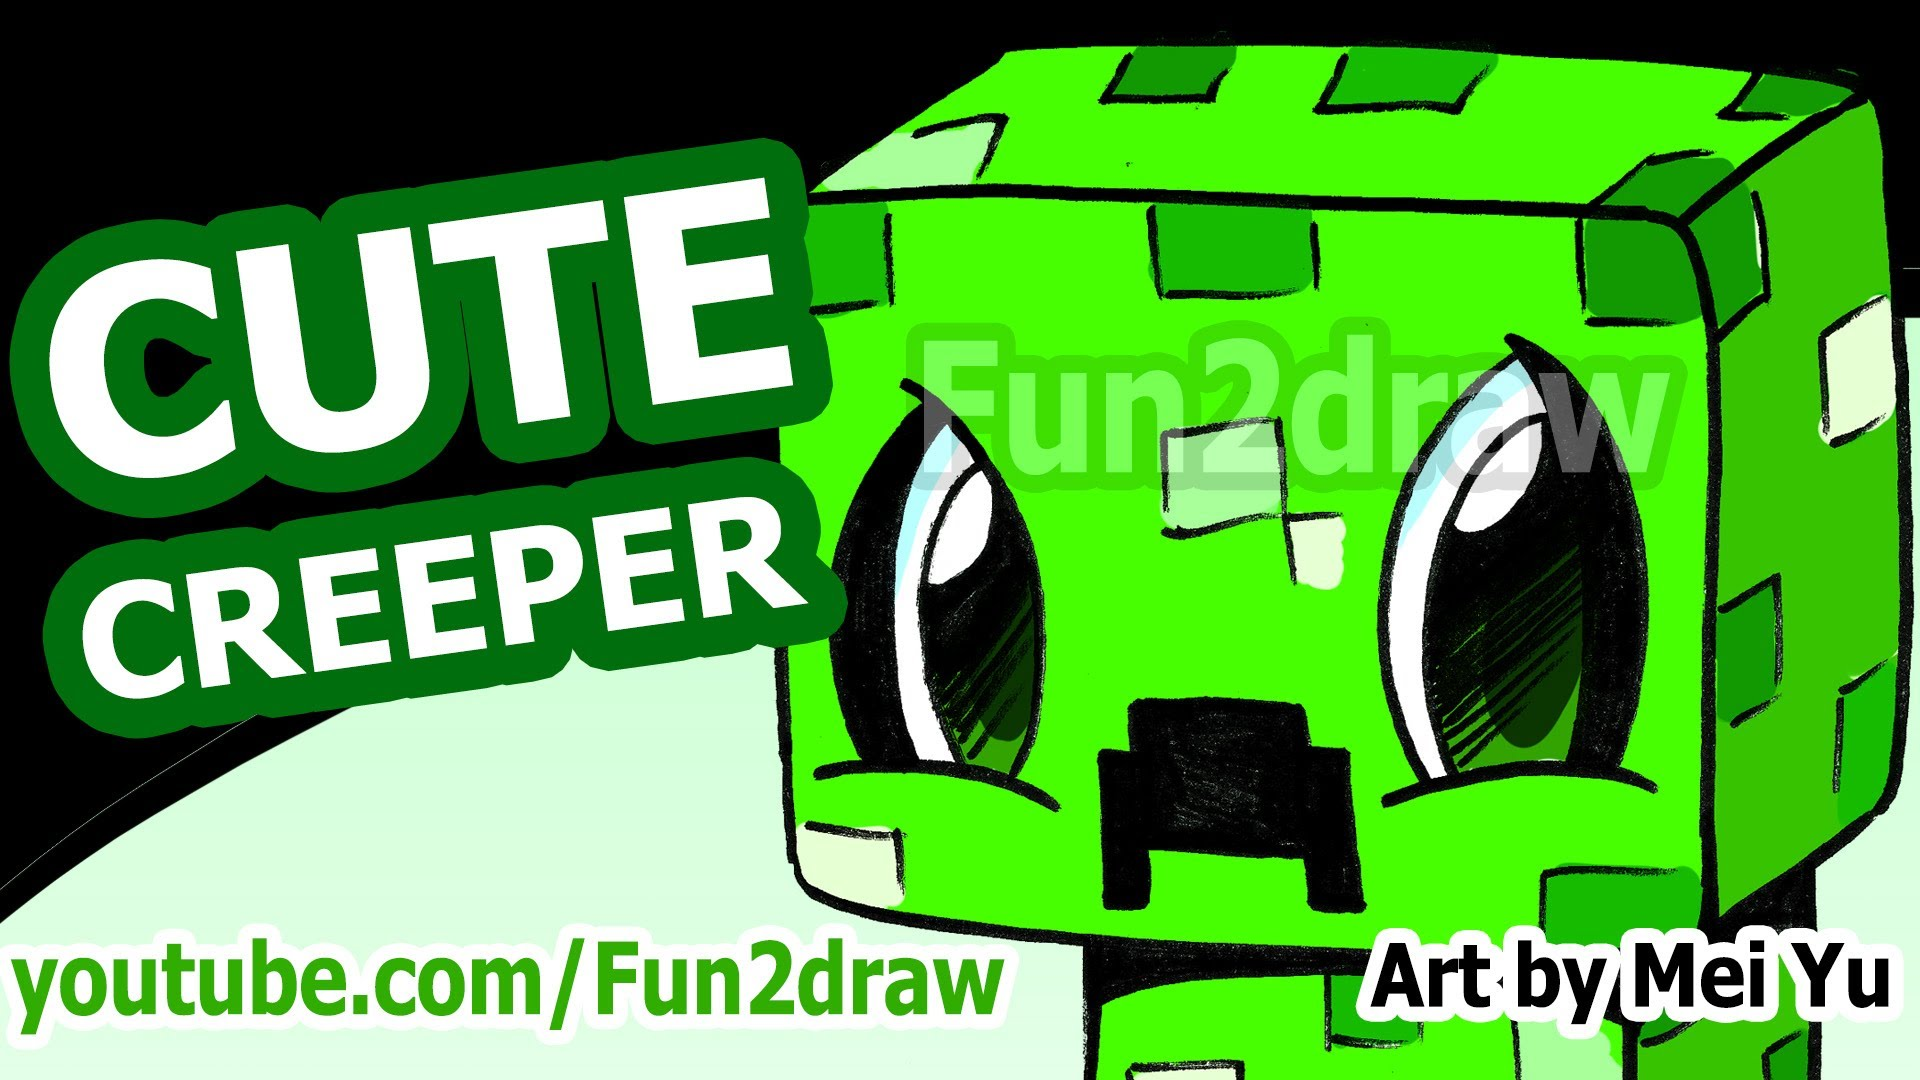 1920x1080 Cute Creeper! How To Draw A Minecraft Creeper